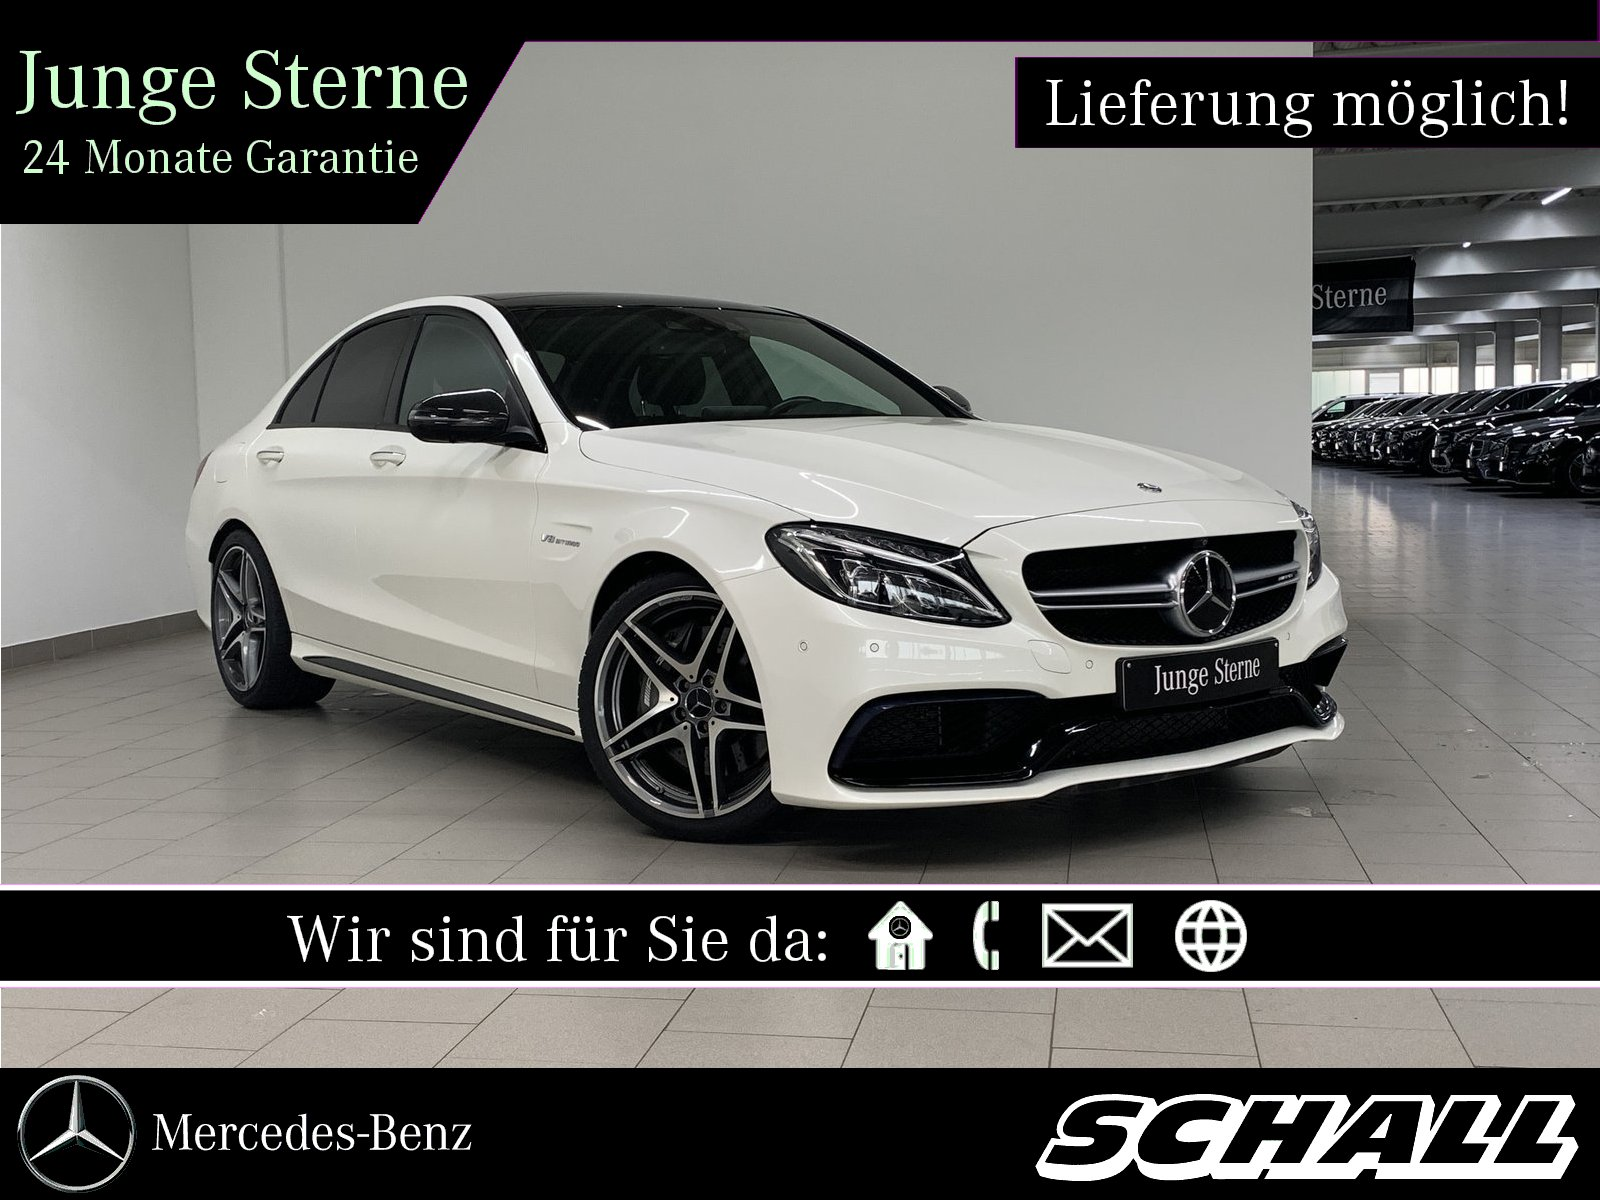 "Mercedes-Benz C 63 AMG PERF.ABGAS+CARBON II+NIGHT+PANO+19""AMG, Jahr 2017, petrol"